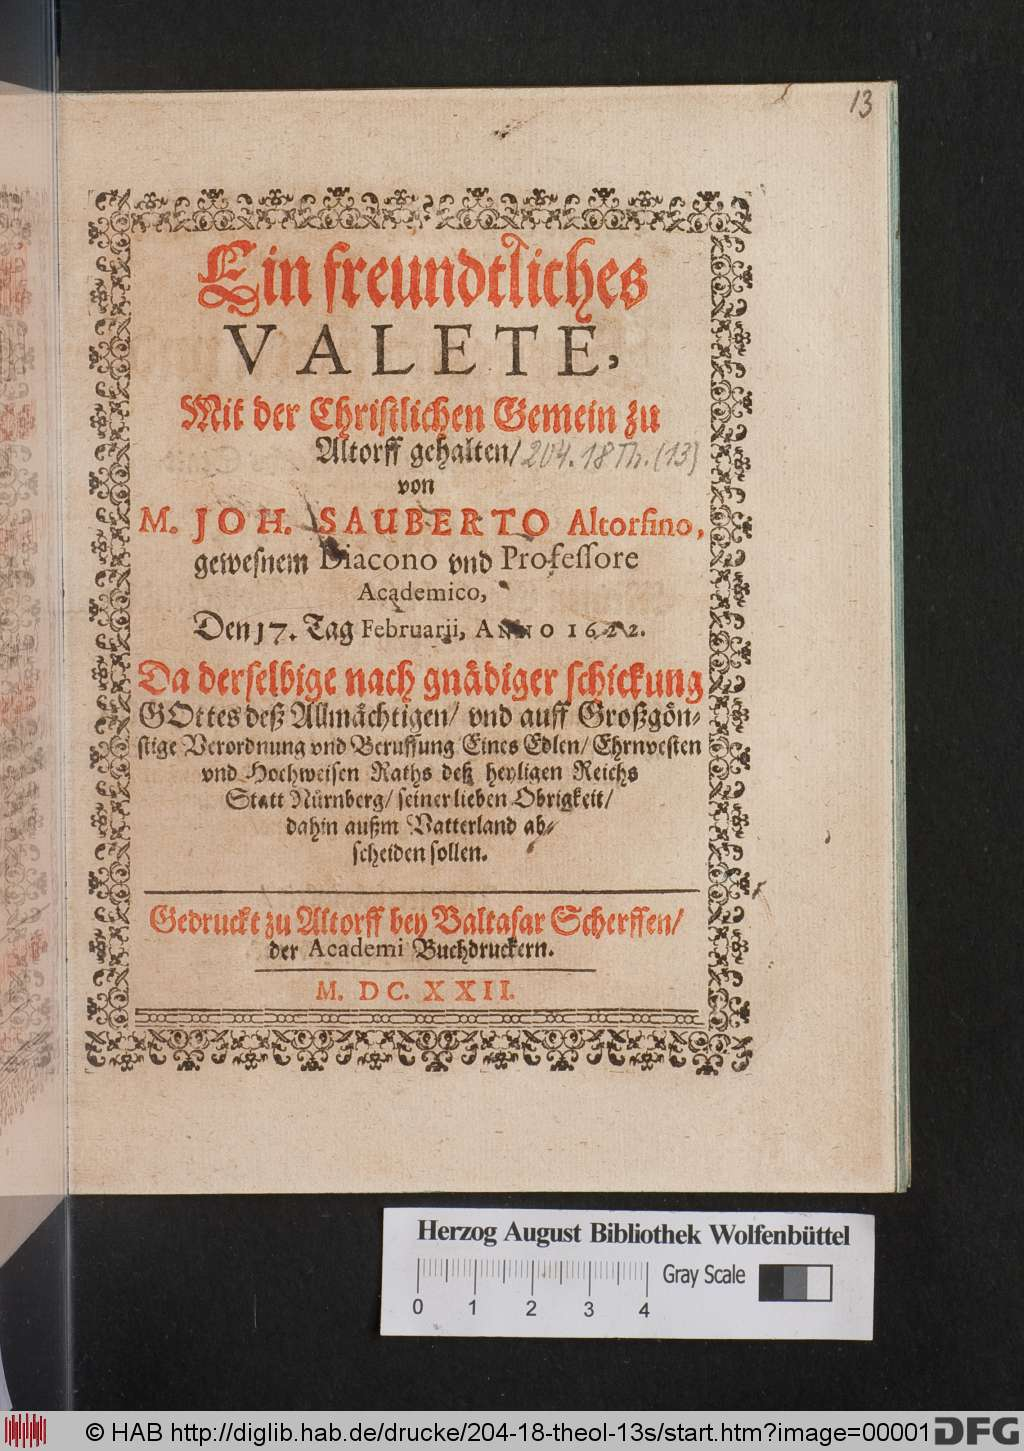 http://diglib.hab.de/drucke/204-18-theol-13s/00001.jpg